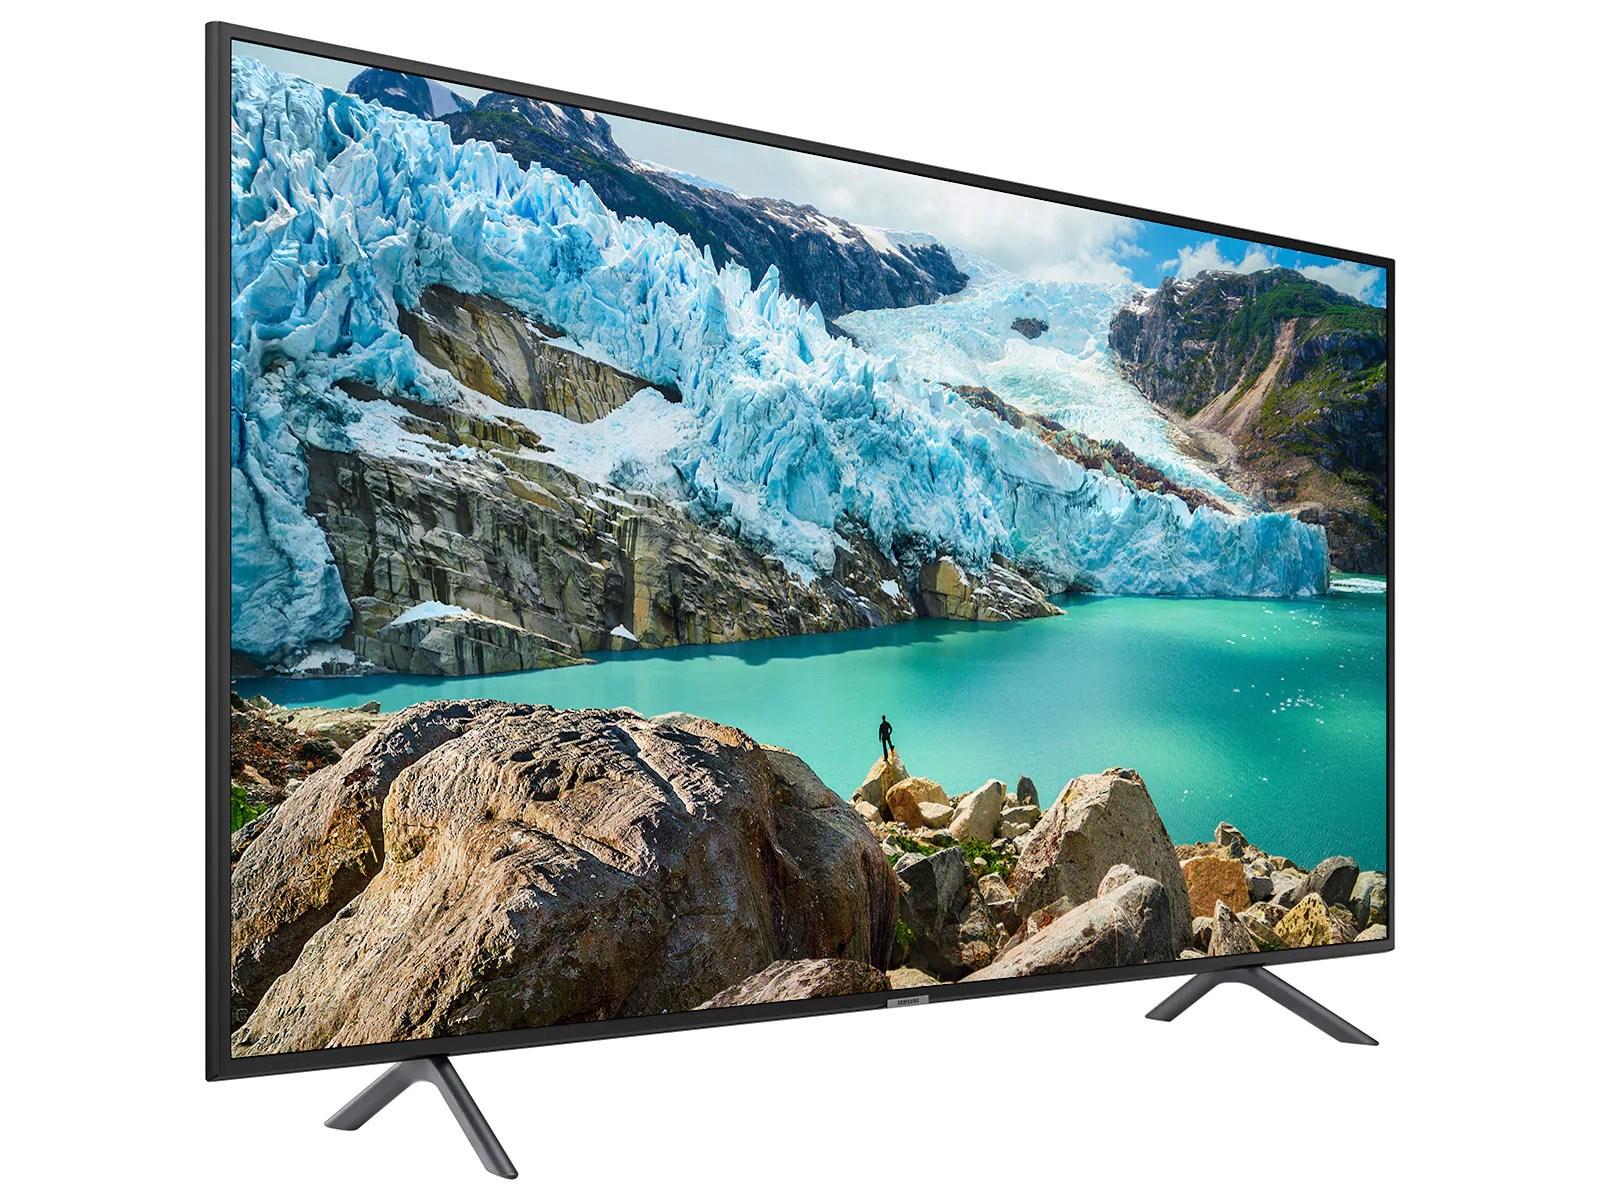 Samsung RU7100 (50 inch) HDR 4K UHD Smart LED Television (Black)